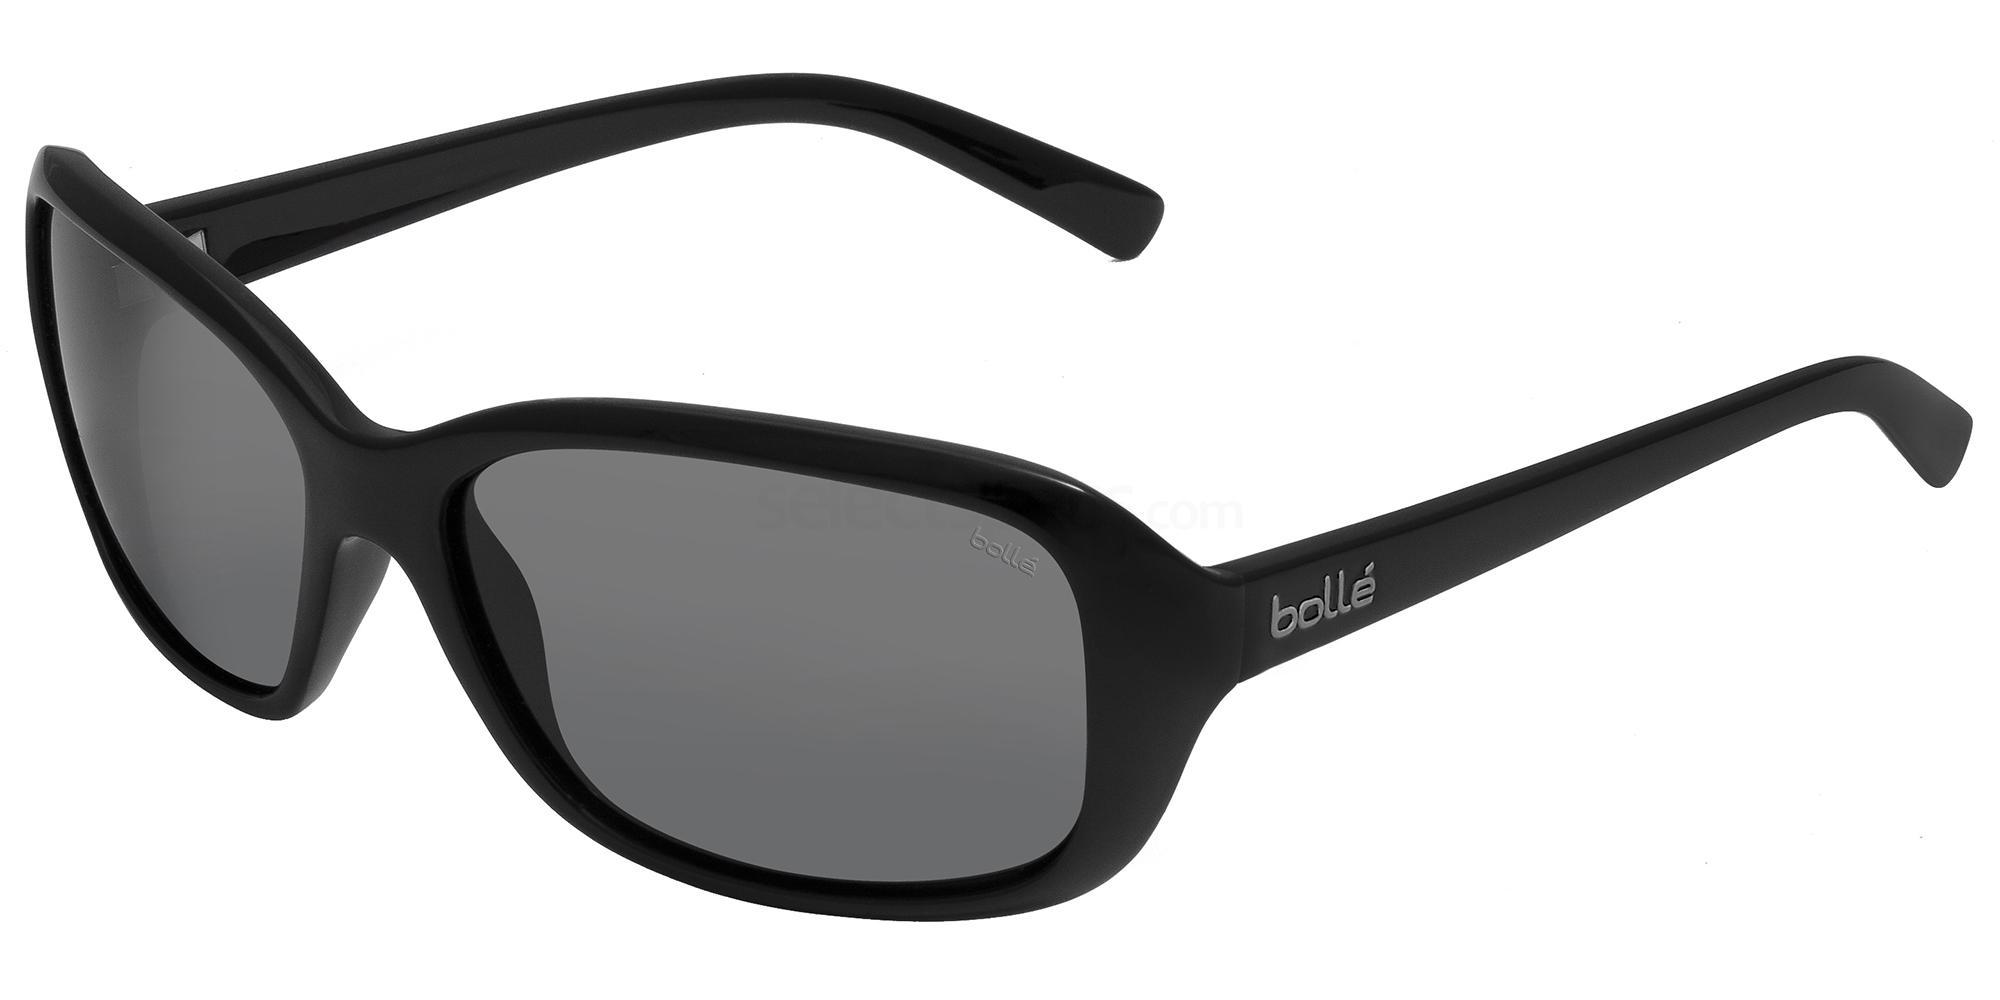 11510 Molly Sunglasses, Bolle